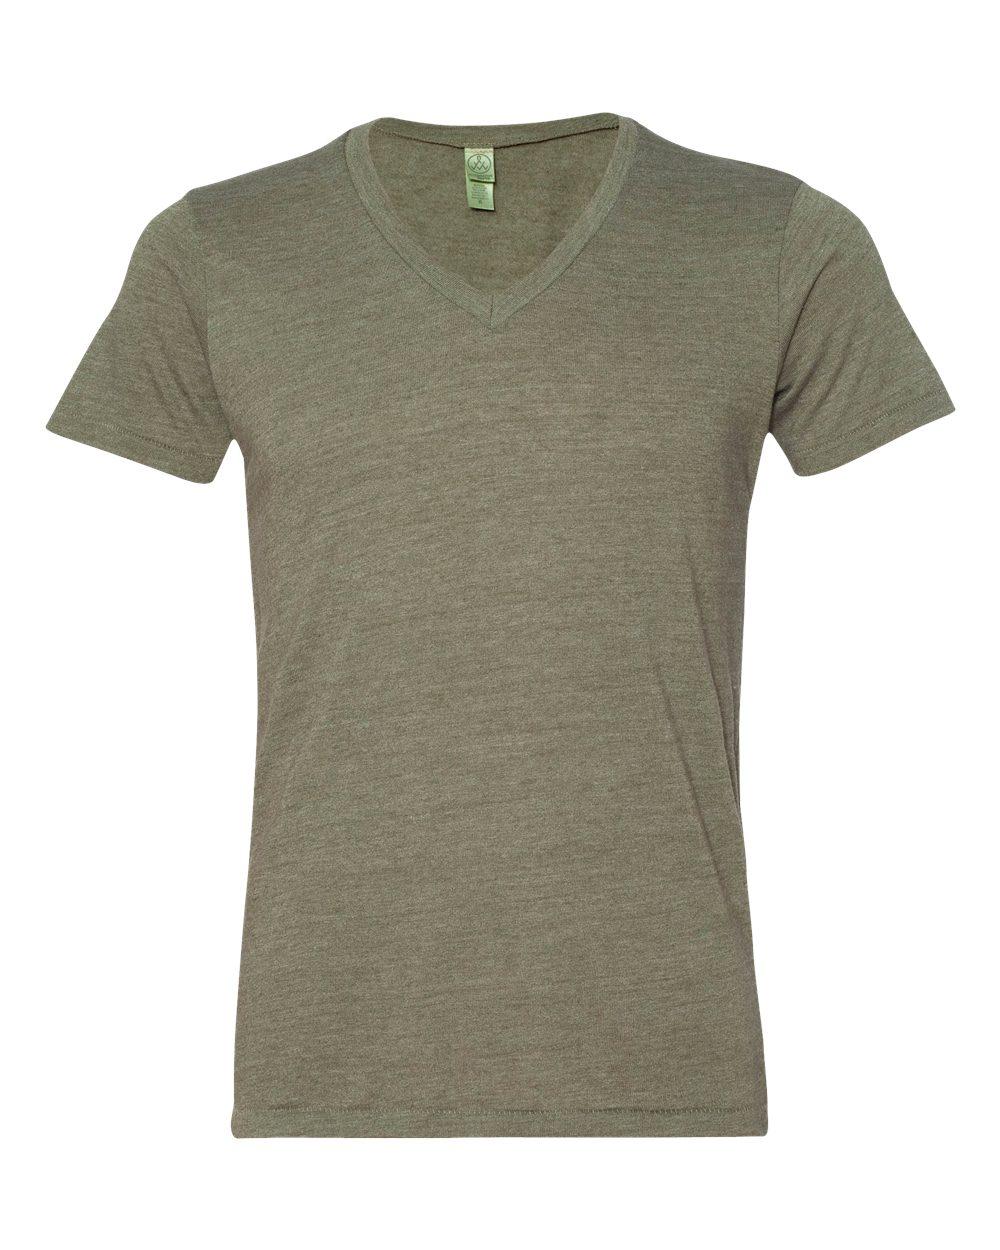 Custom v necks kirkwood trading company for St louis t shirt printing